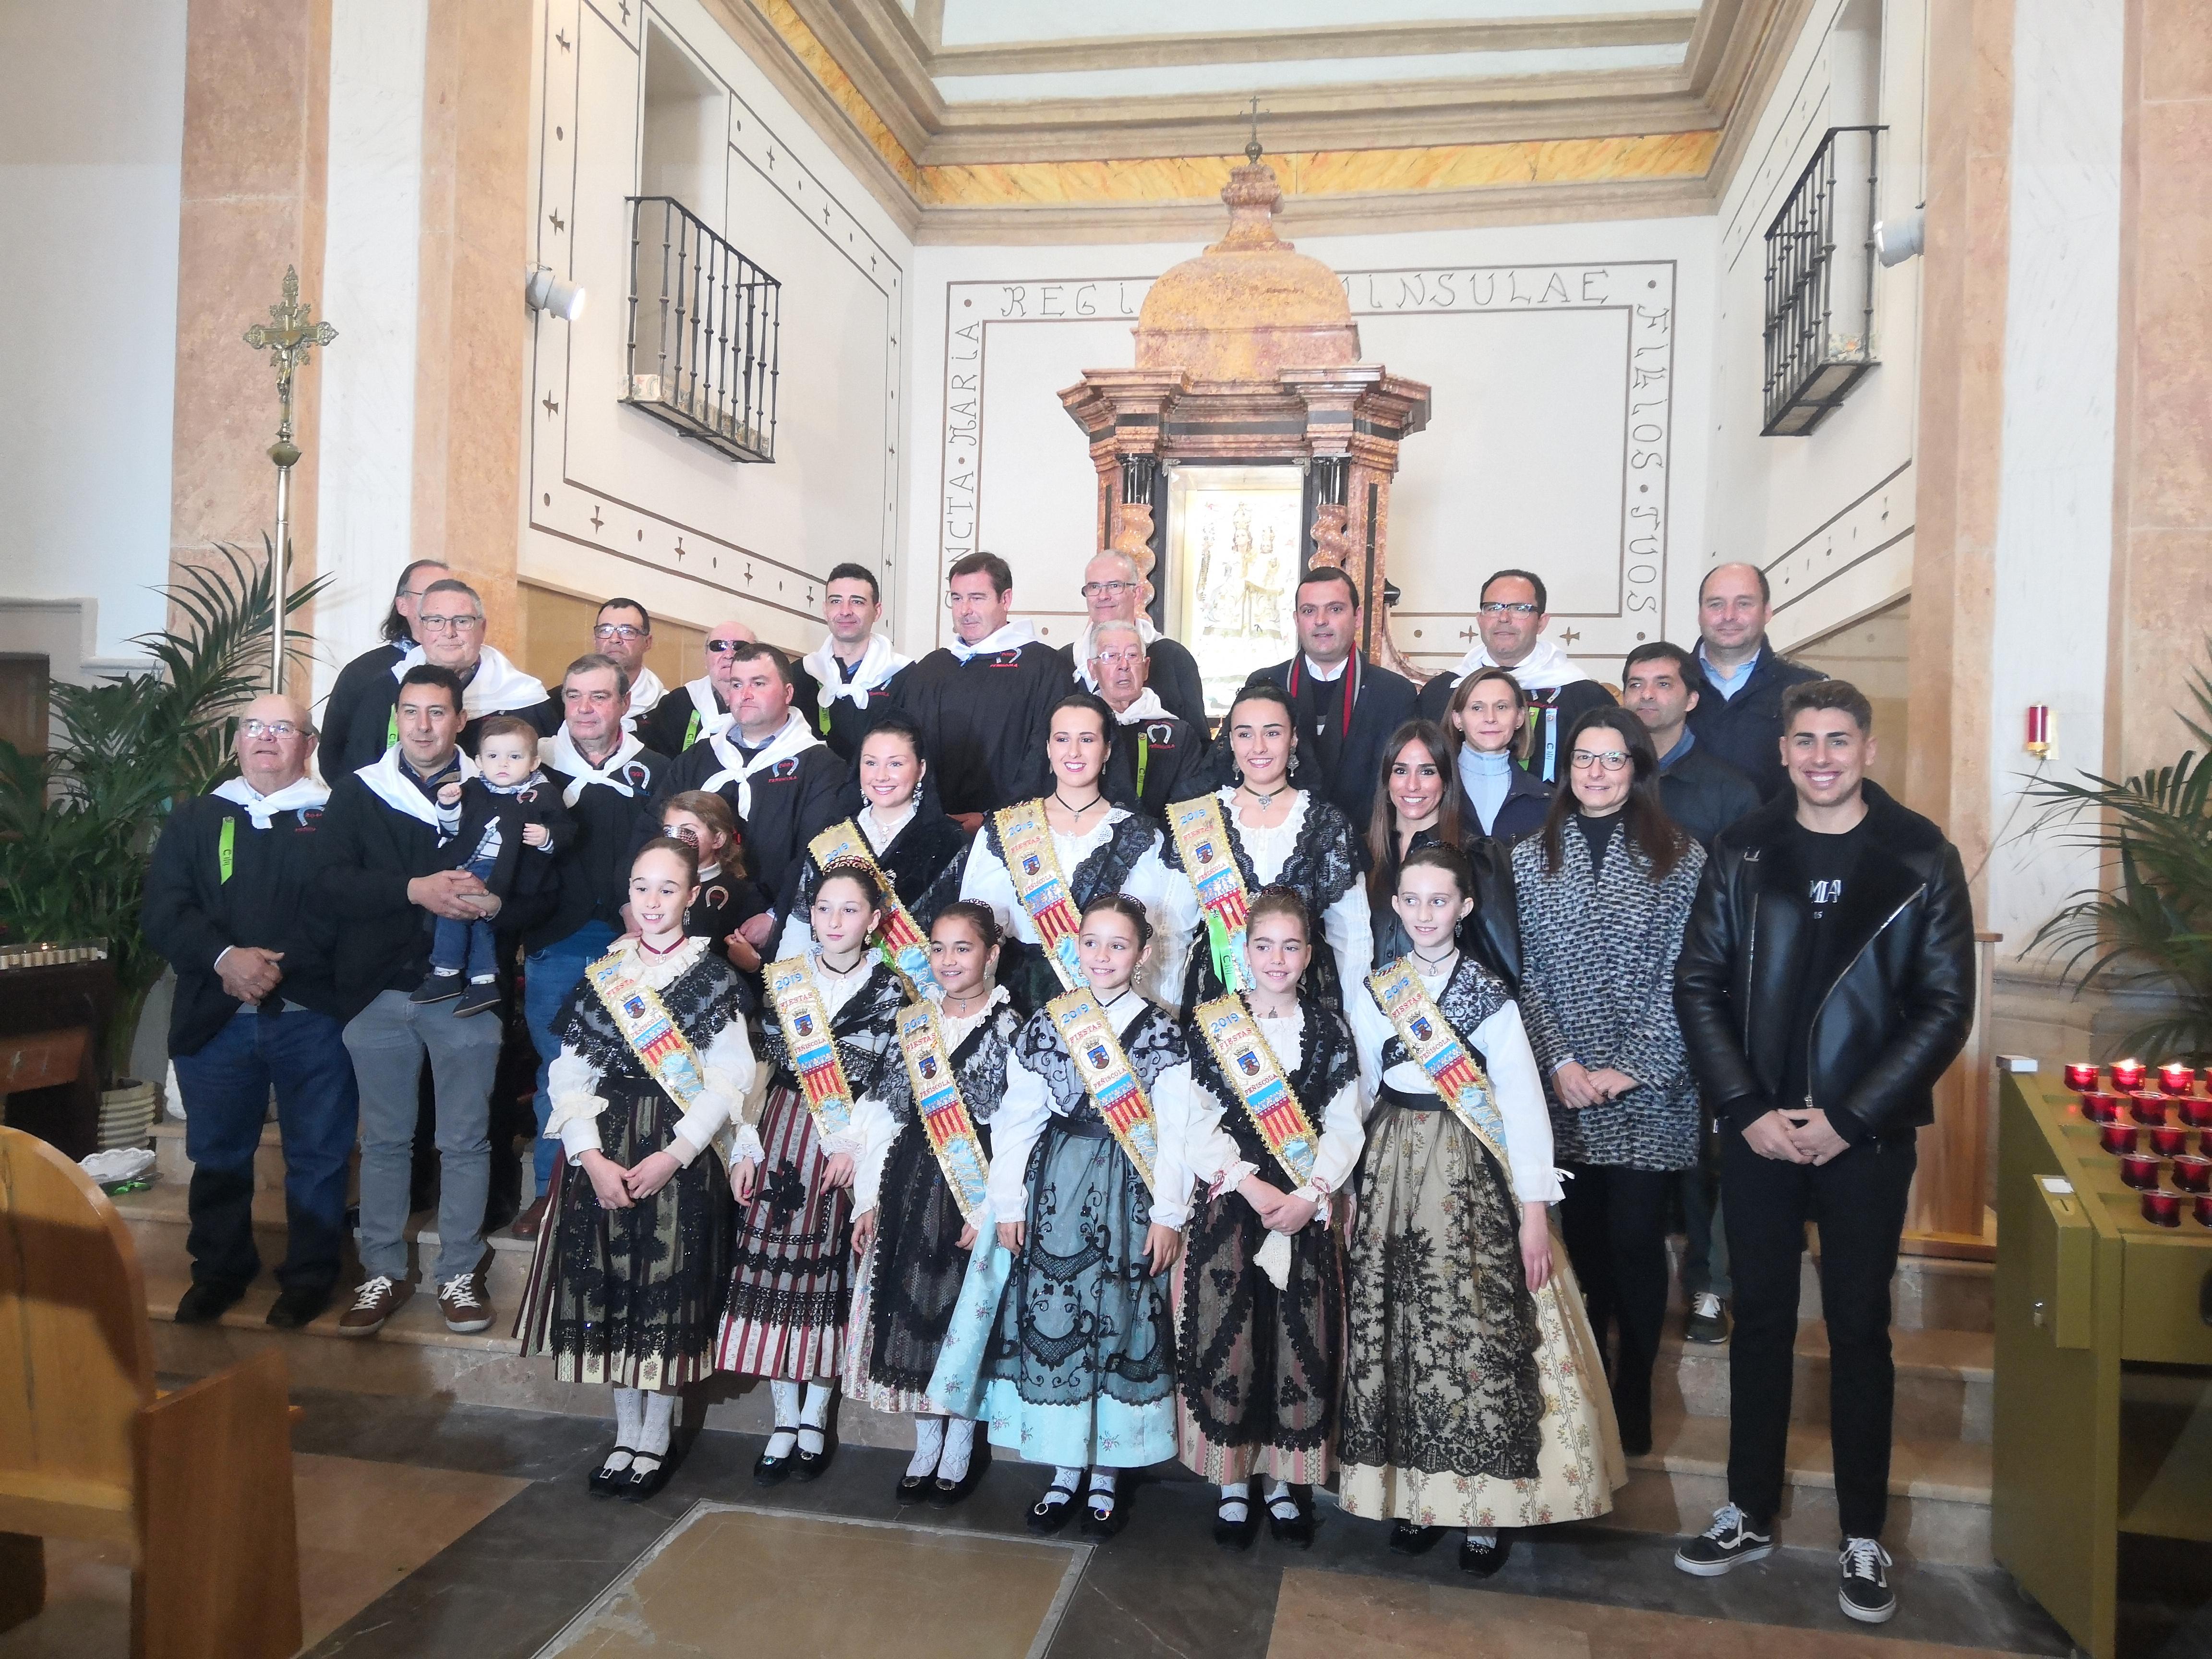 Peníscola celebra la festivitat del dia de Sant Antoni Abat